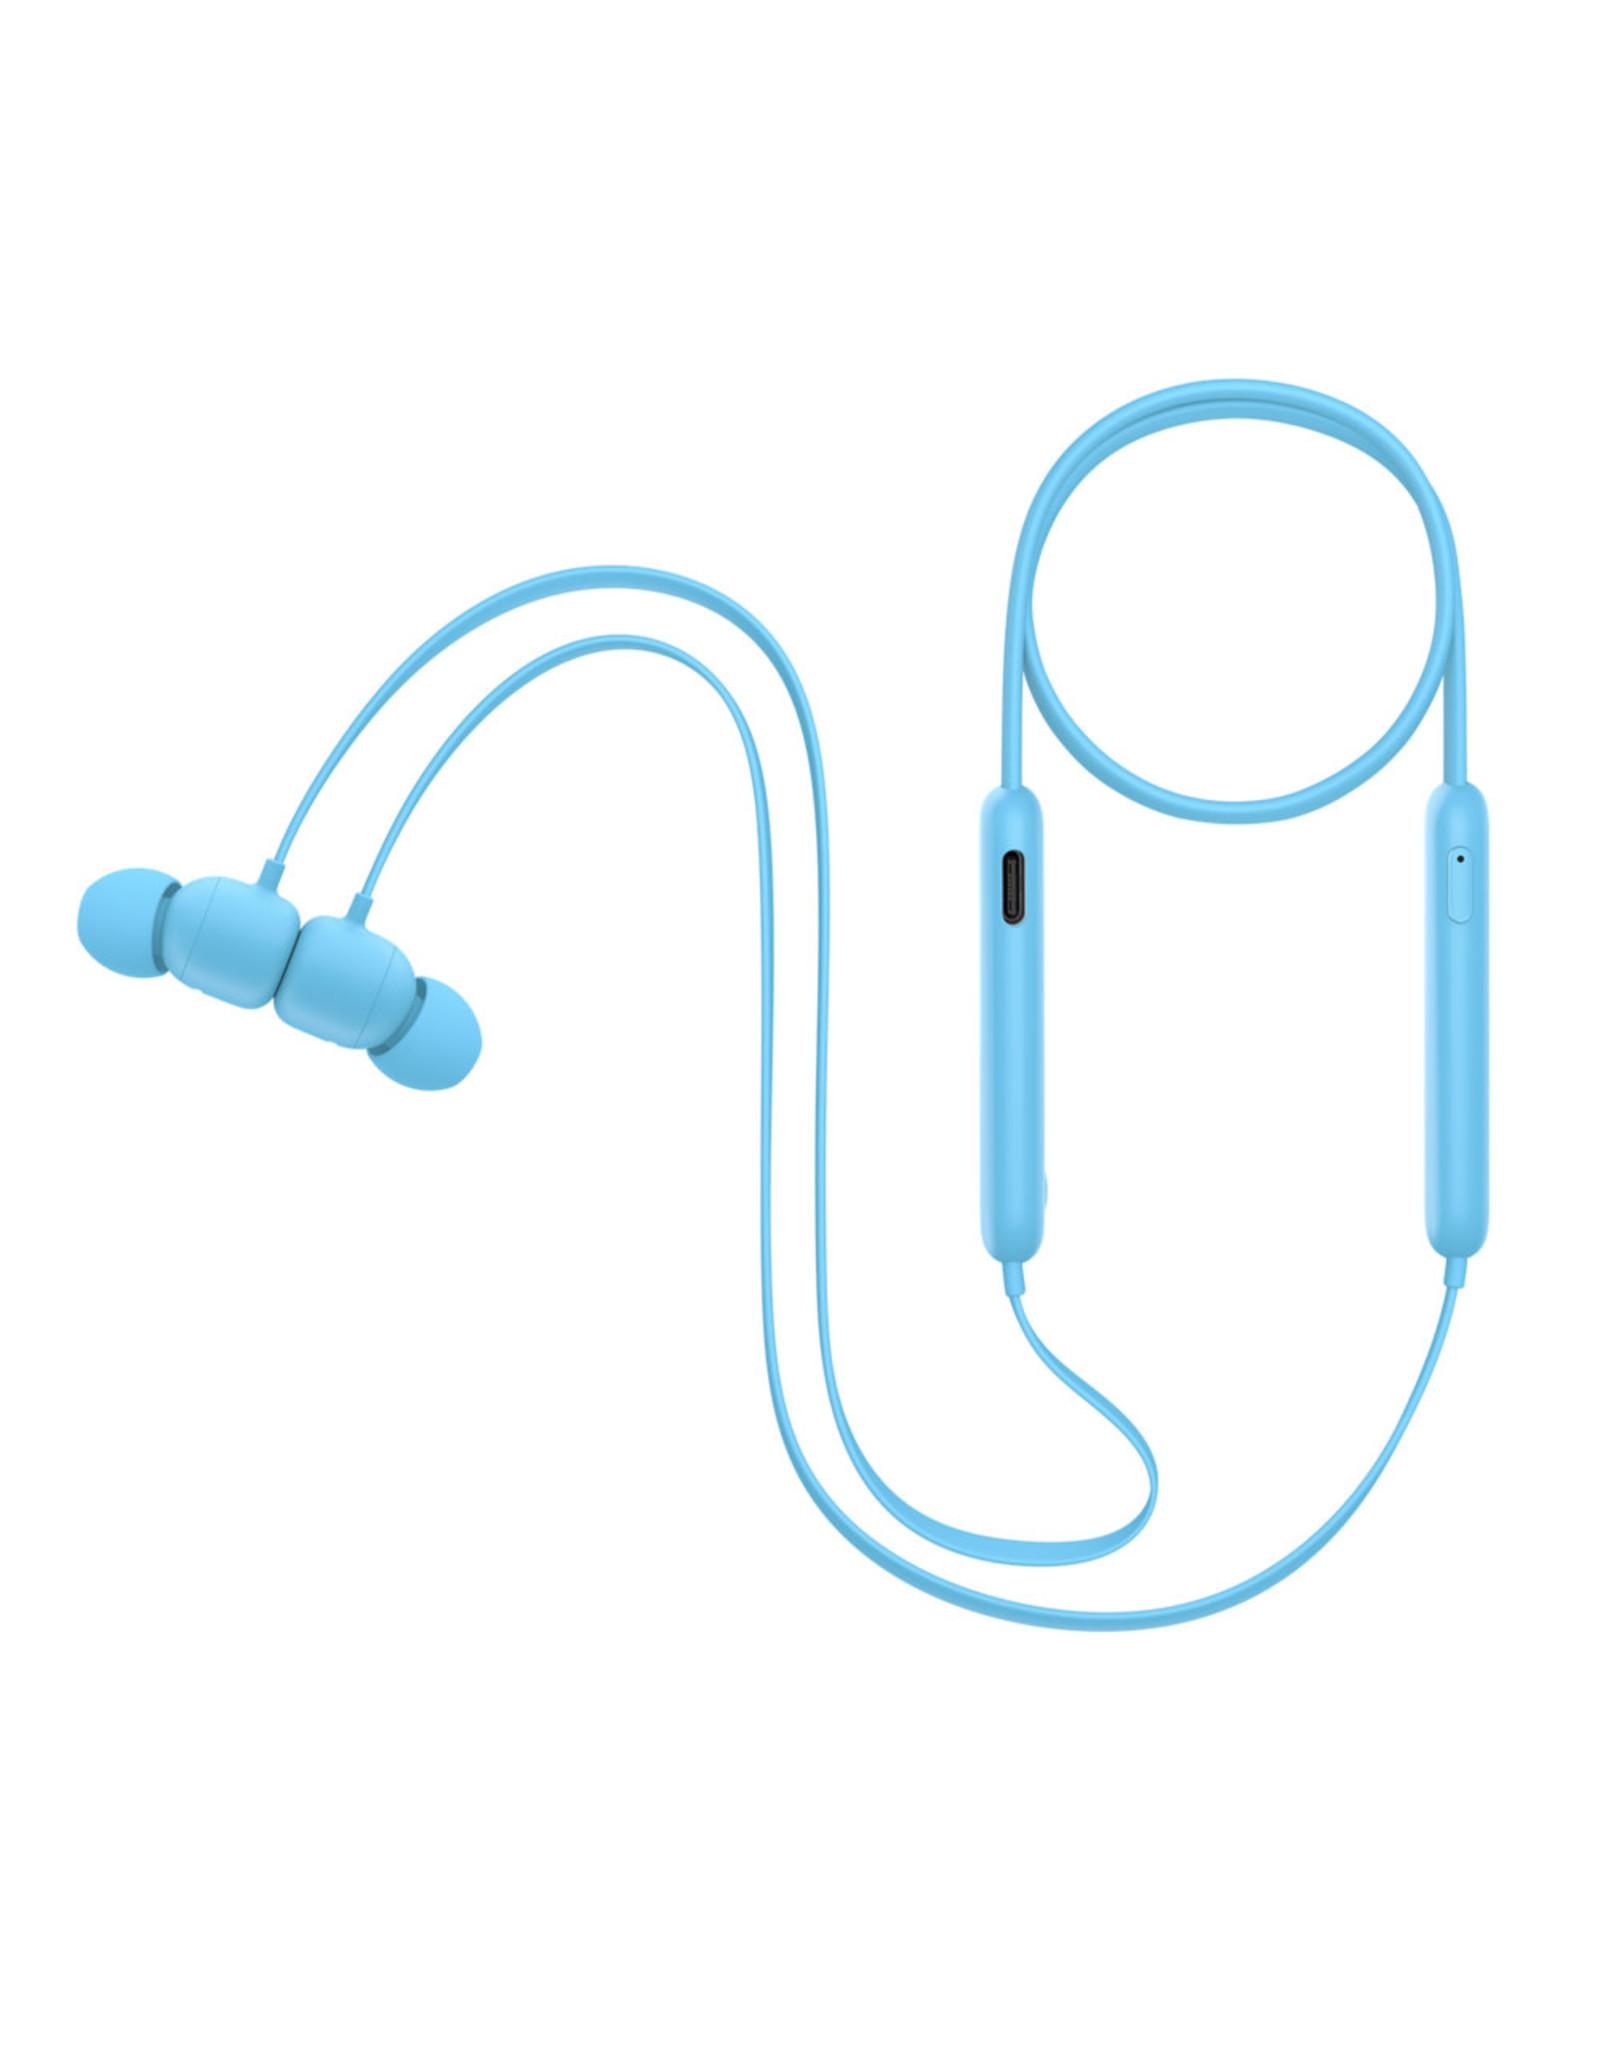 Beats Beats Flex All-Day Wireless Earphones